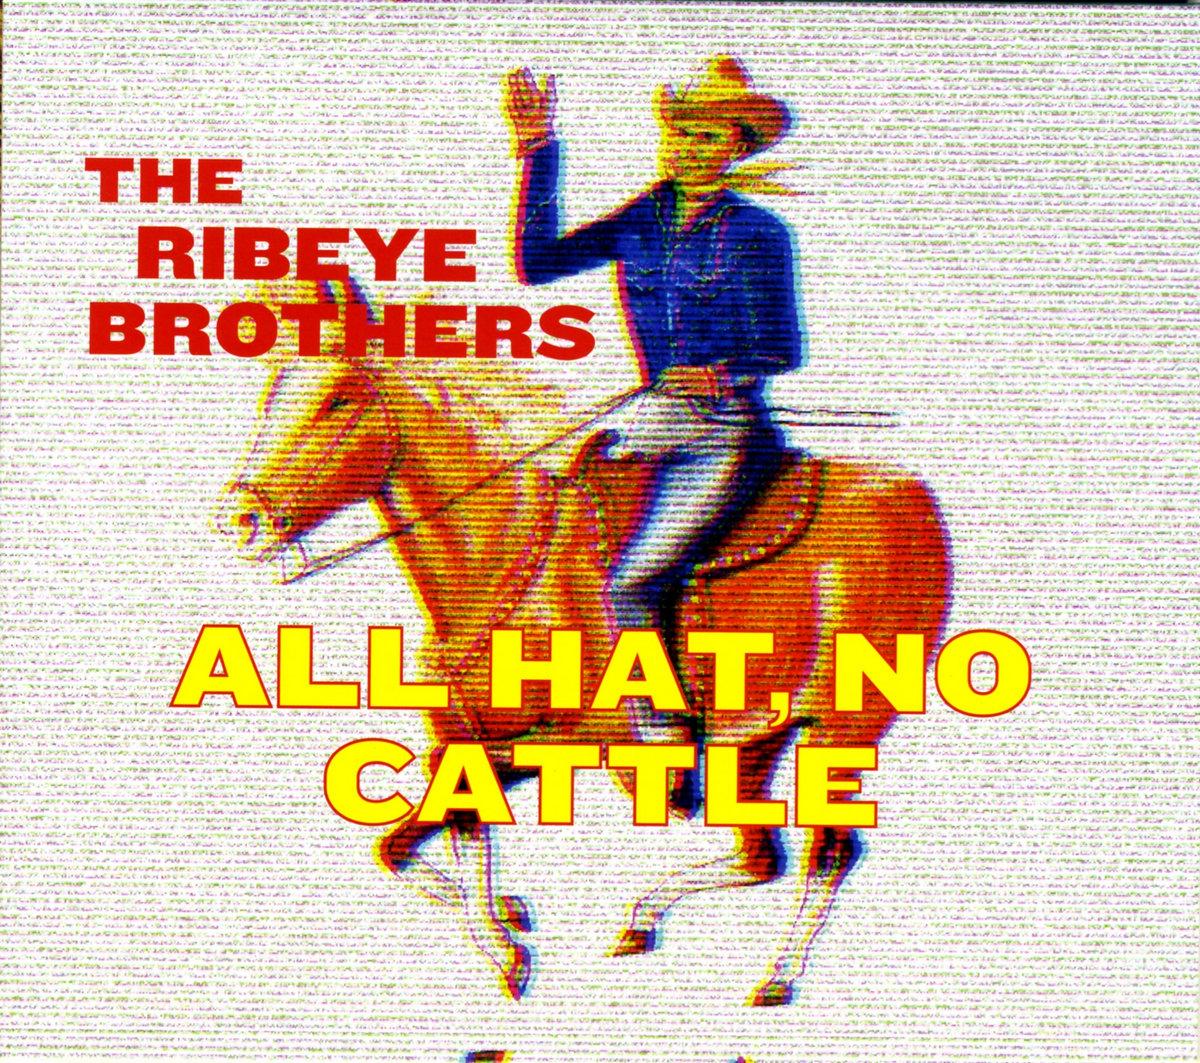 The Ribeye Brothers